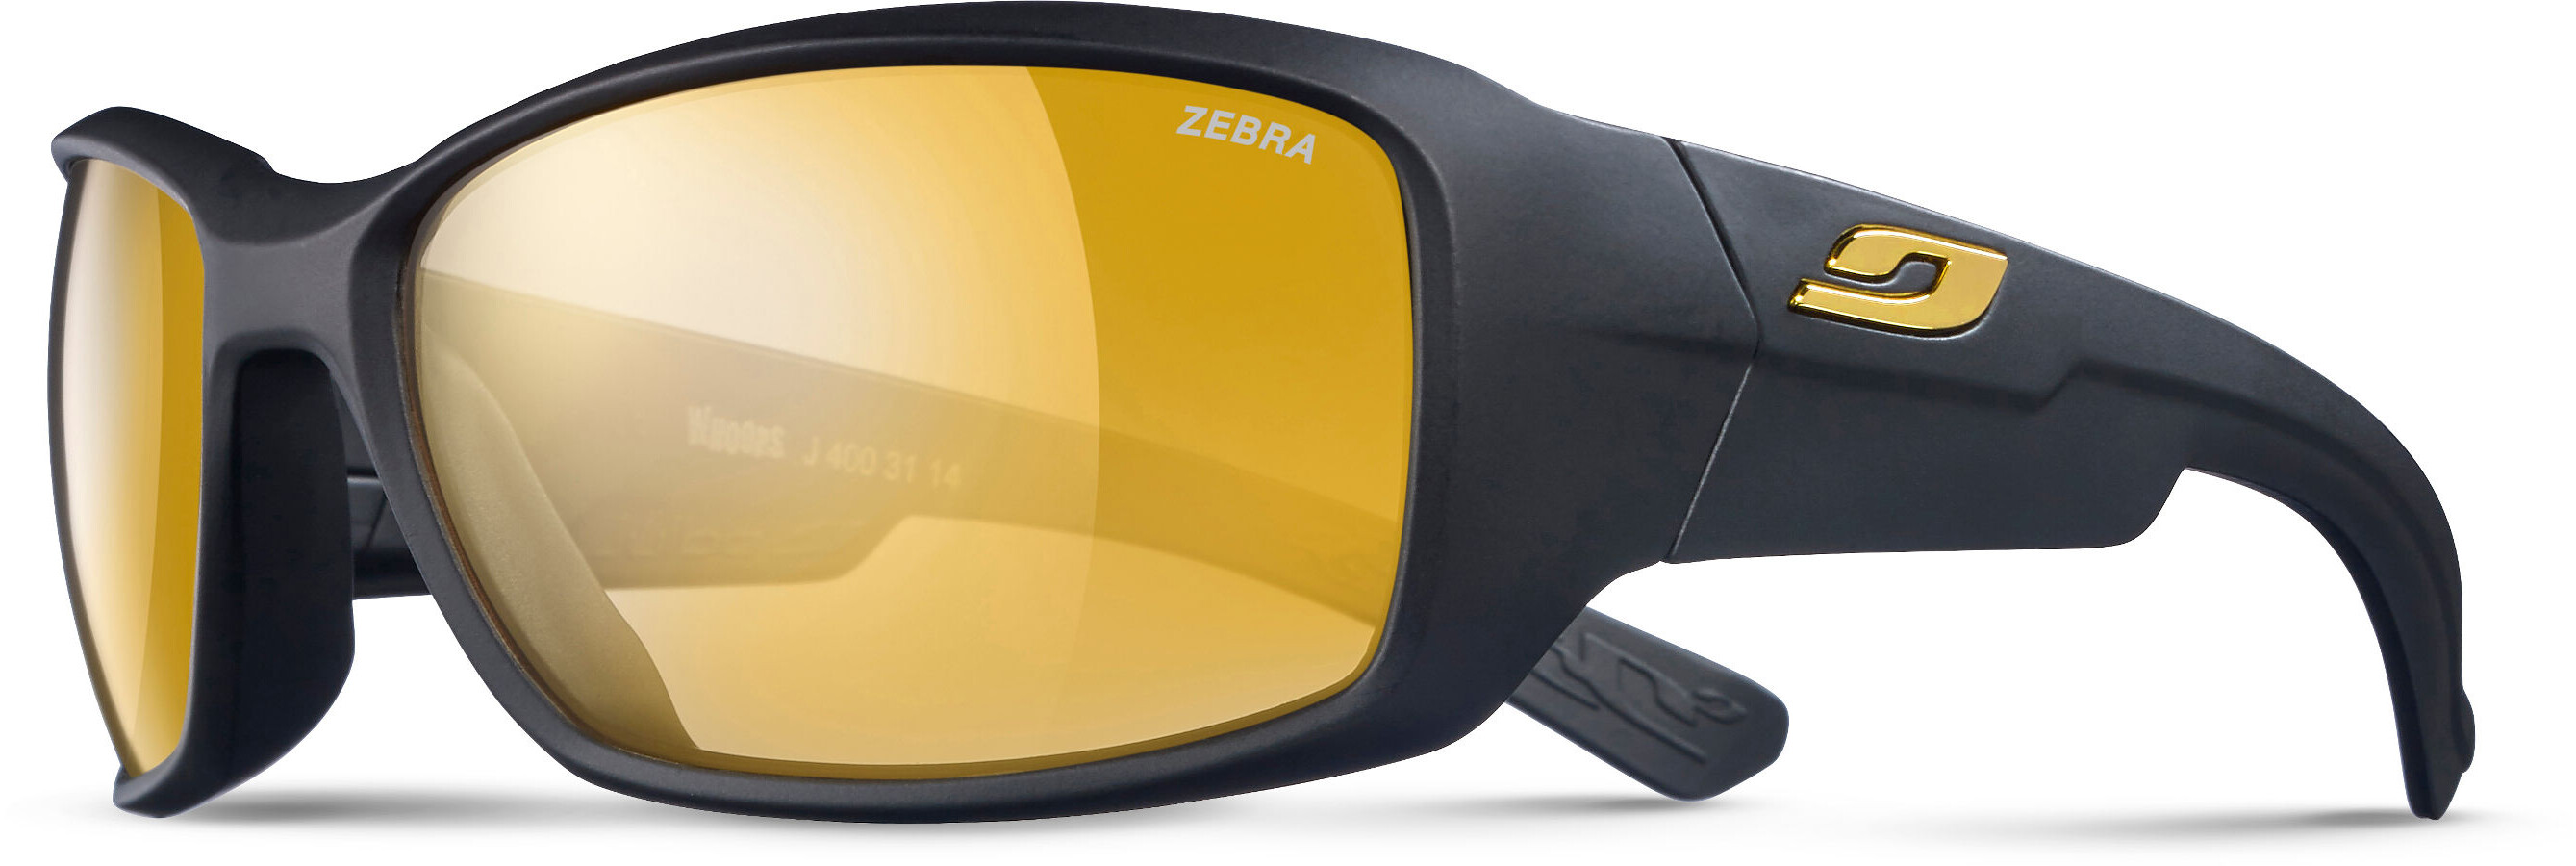 15aeafa261 Julbo Whoops Zebra Glasses yellow black at Addnature.co.uk